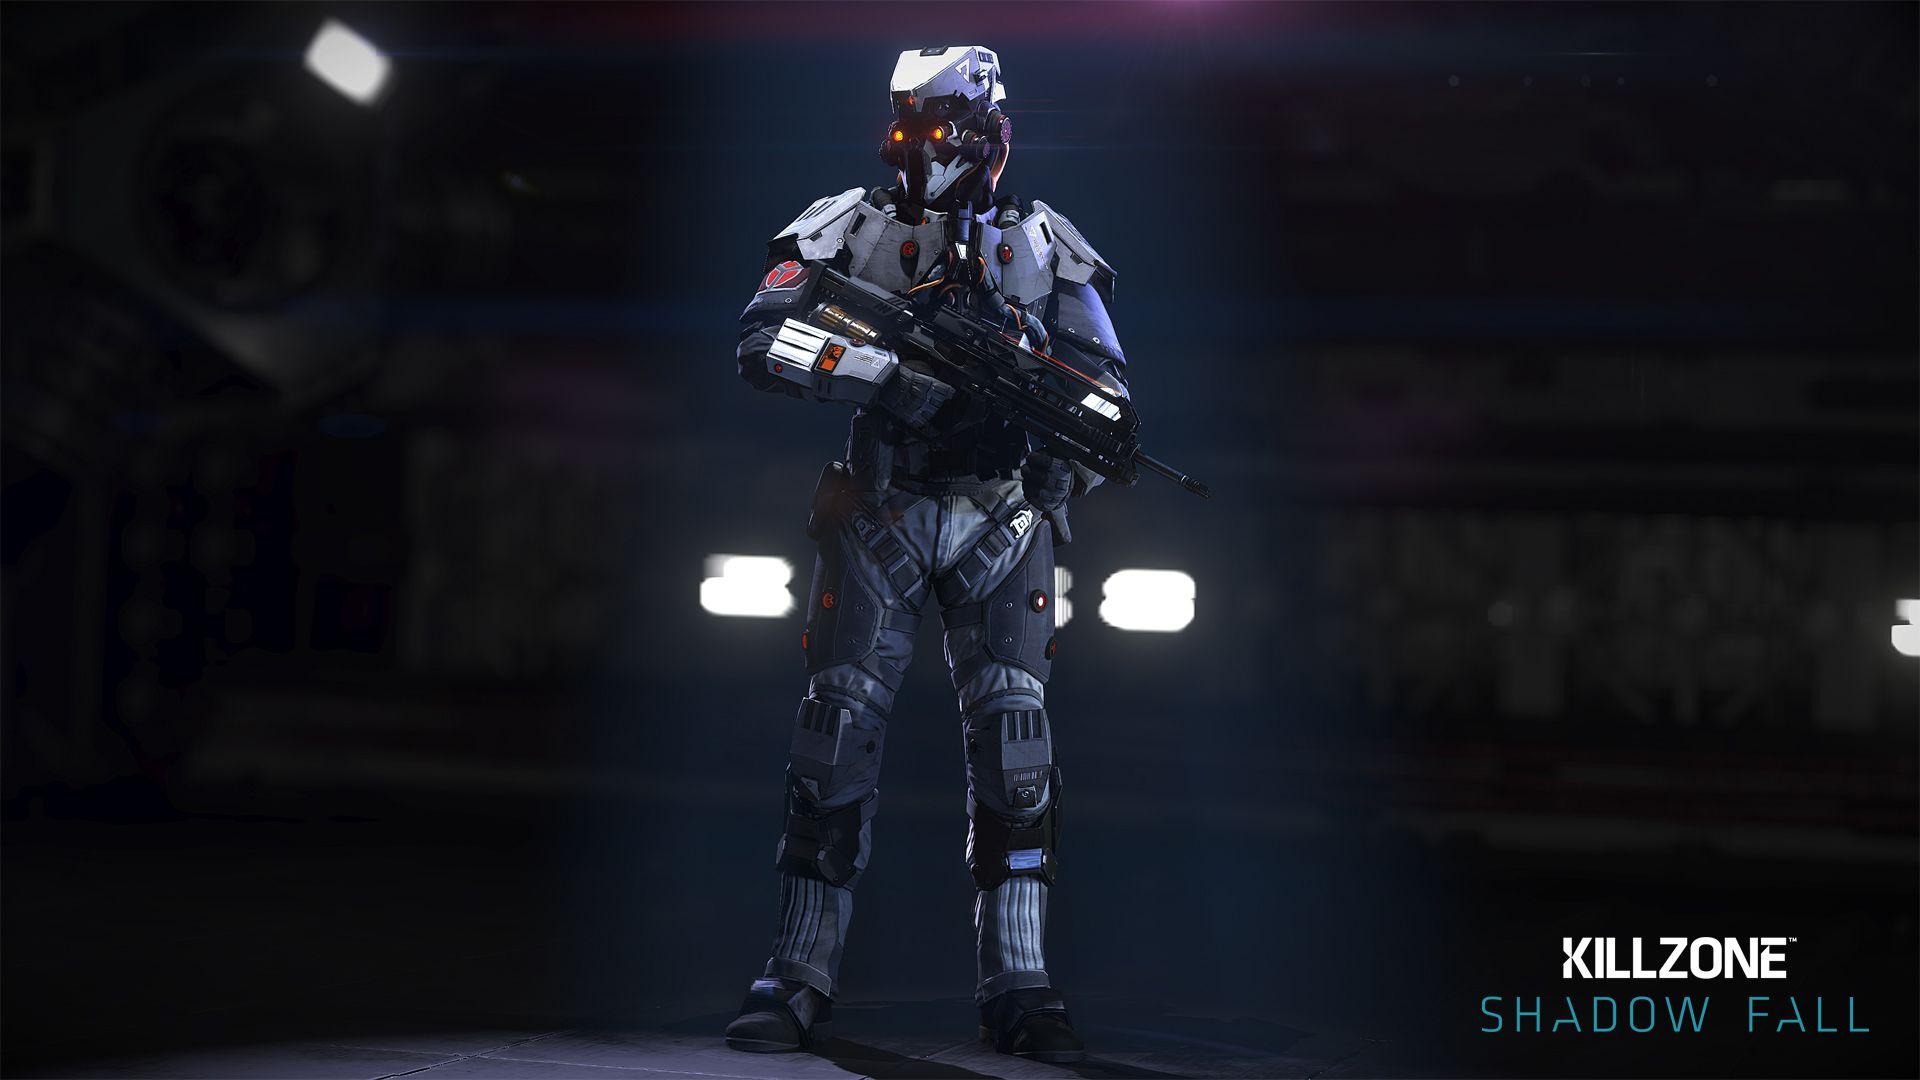 Killzone-ShadowFall PS4 Editeur 033